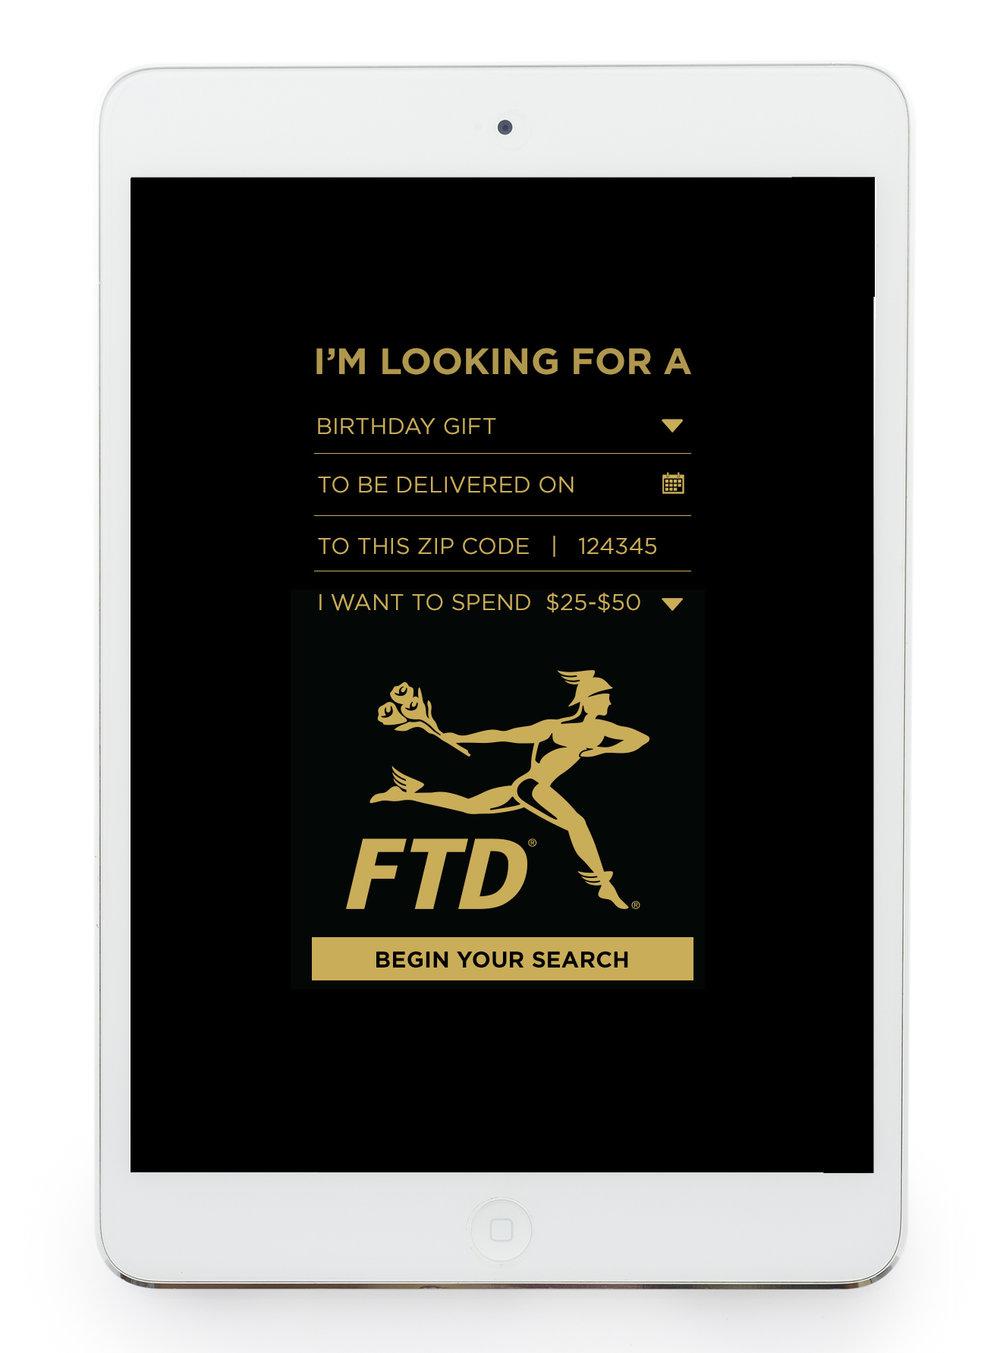 FTD_Flo_Dir_Inteface_05B.jpg